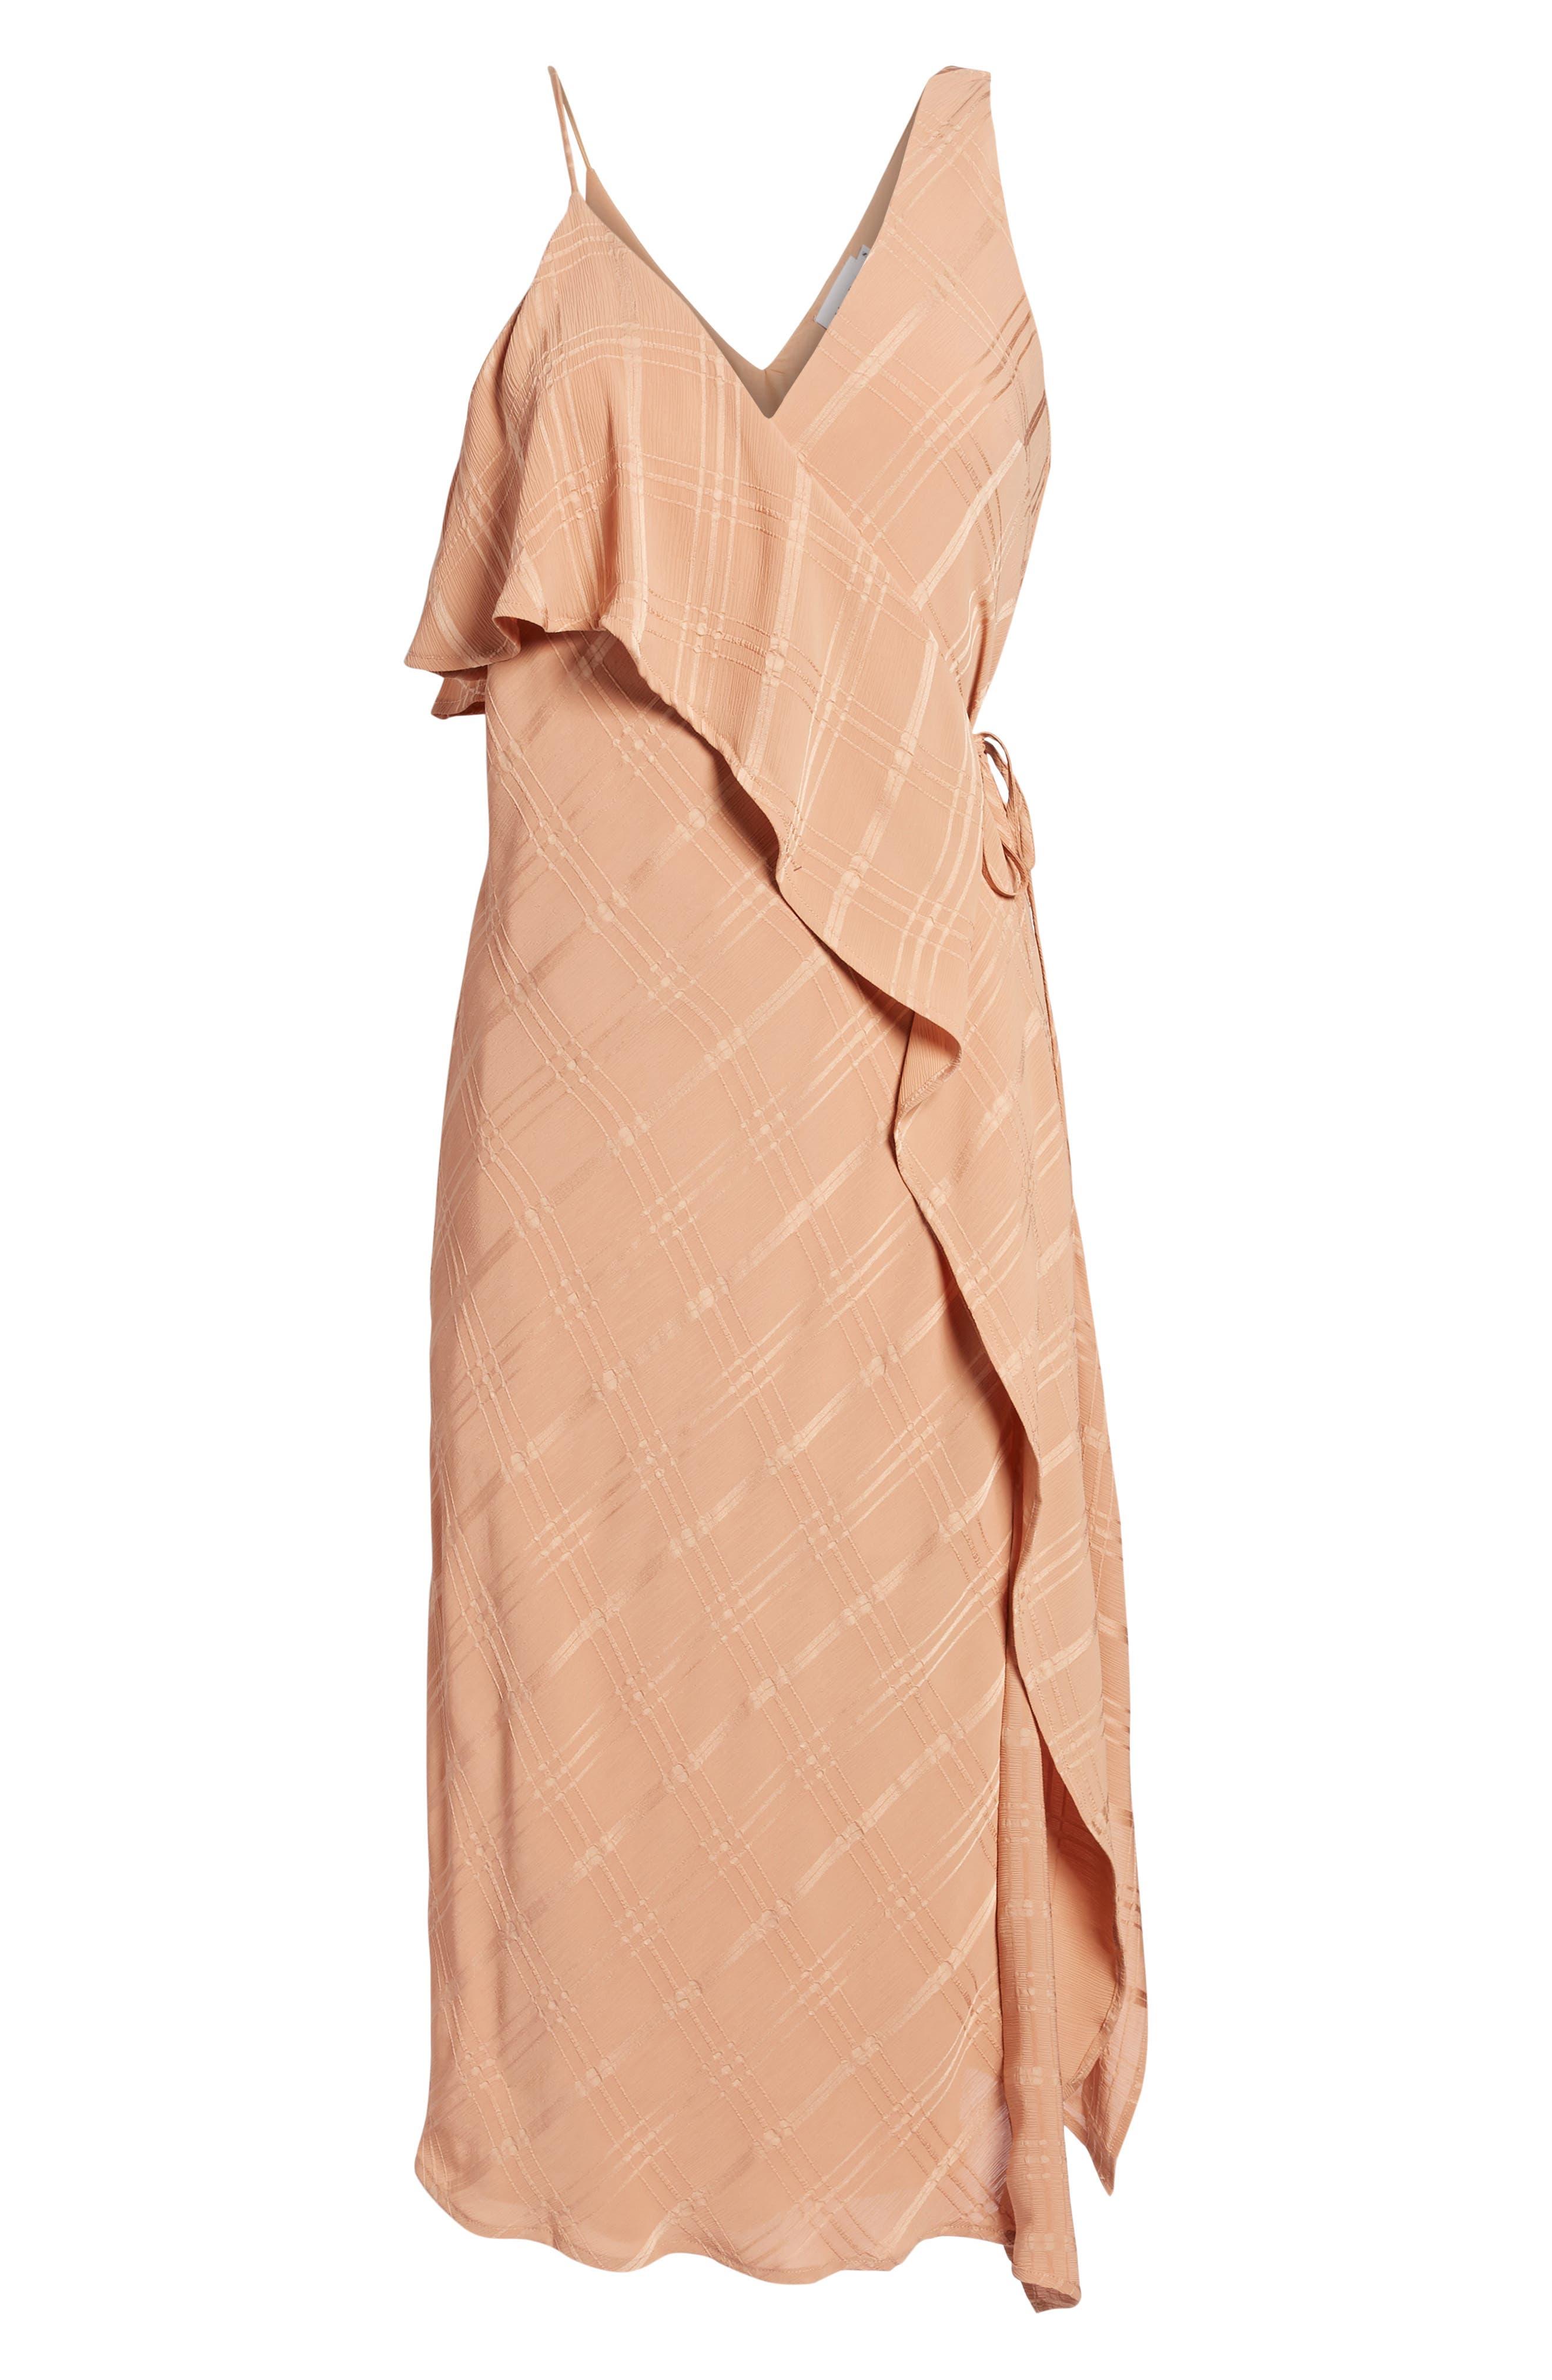 Yoanna Ruffle Trim Wrap Dress,                             Alternate thumbnail 6, color,                             250